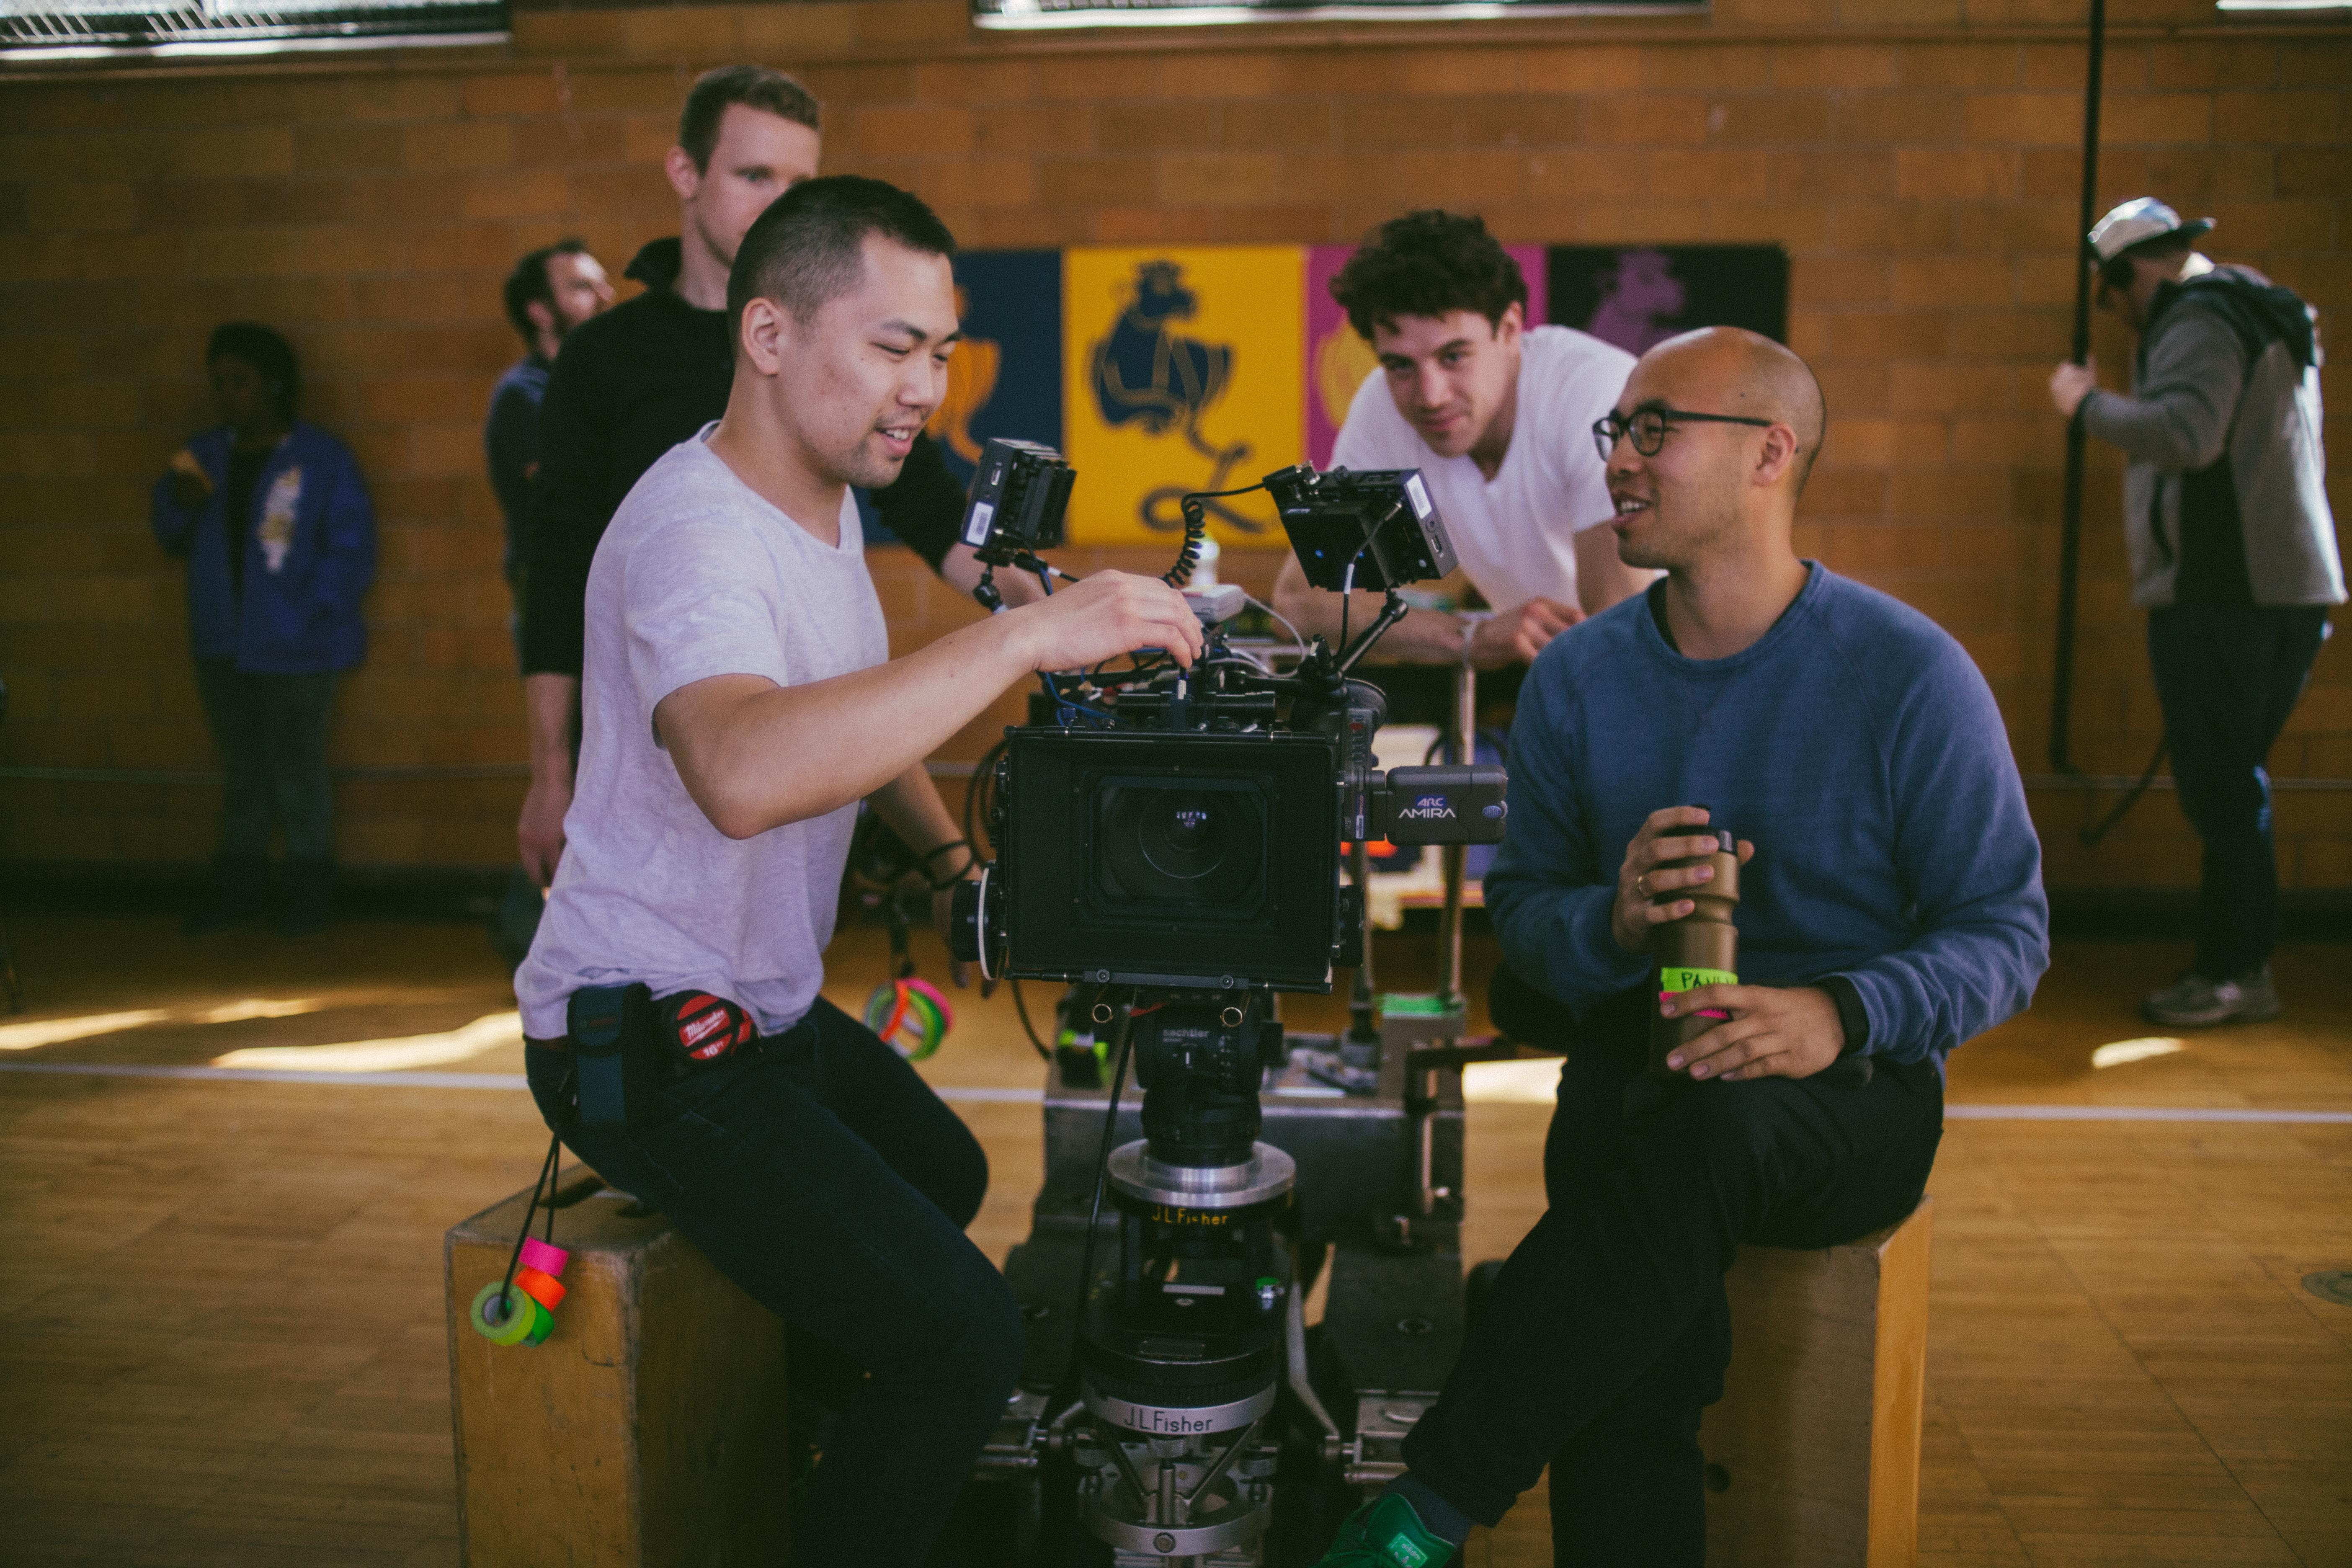 DP Paul Yee with A.C. Jason Chau and Steadicam Op Devon Catucci.